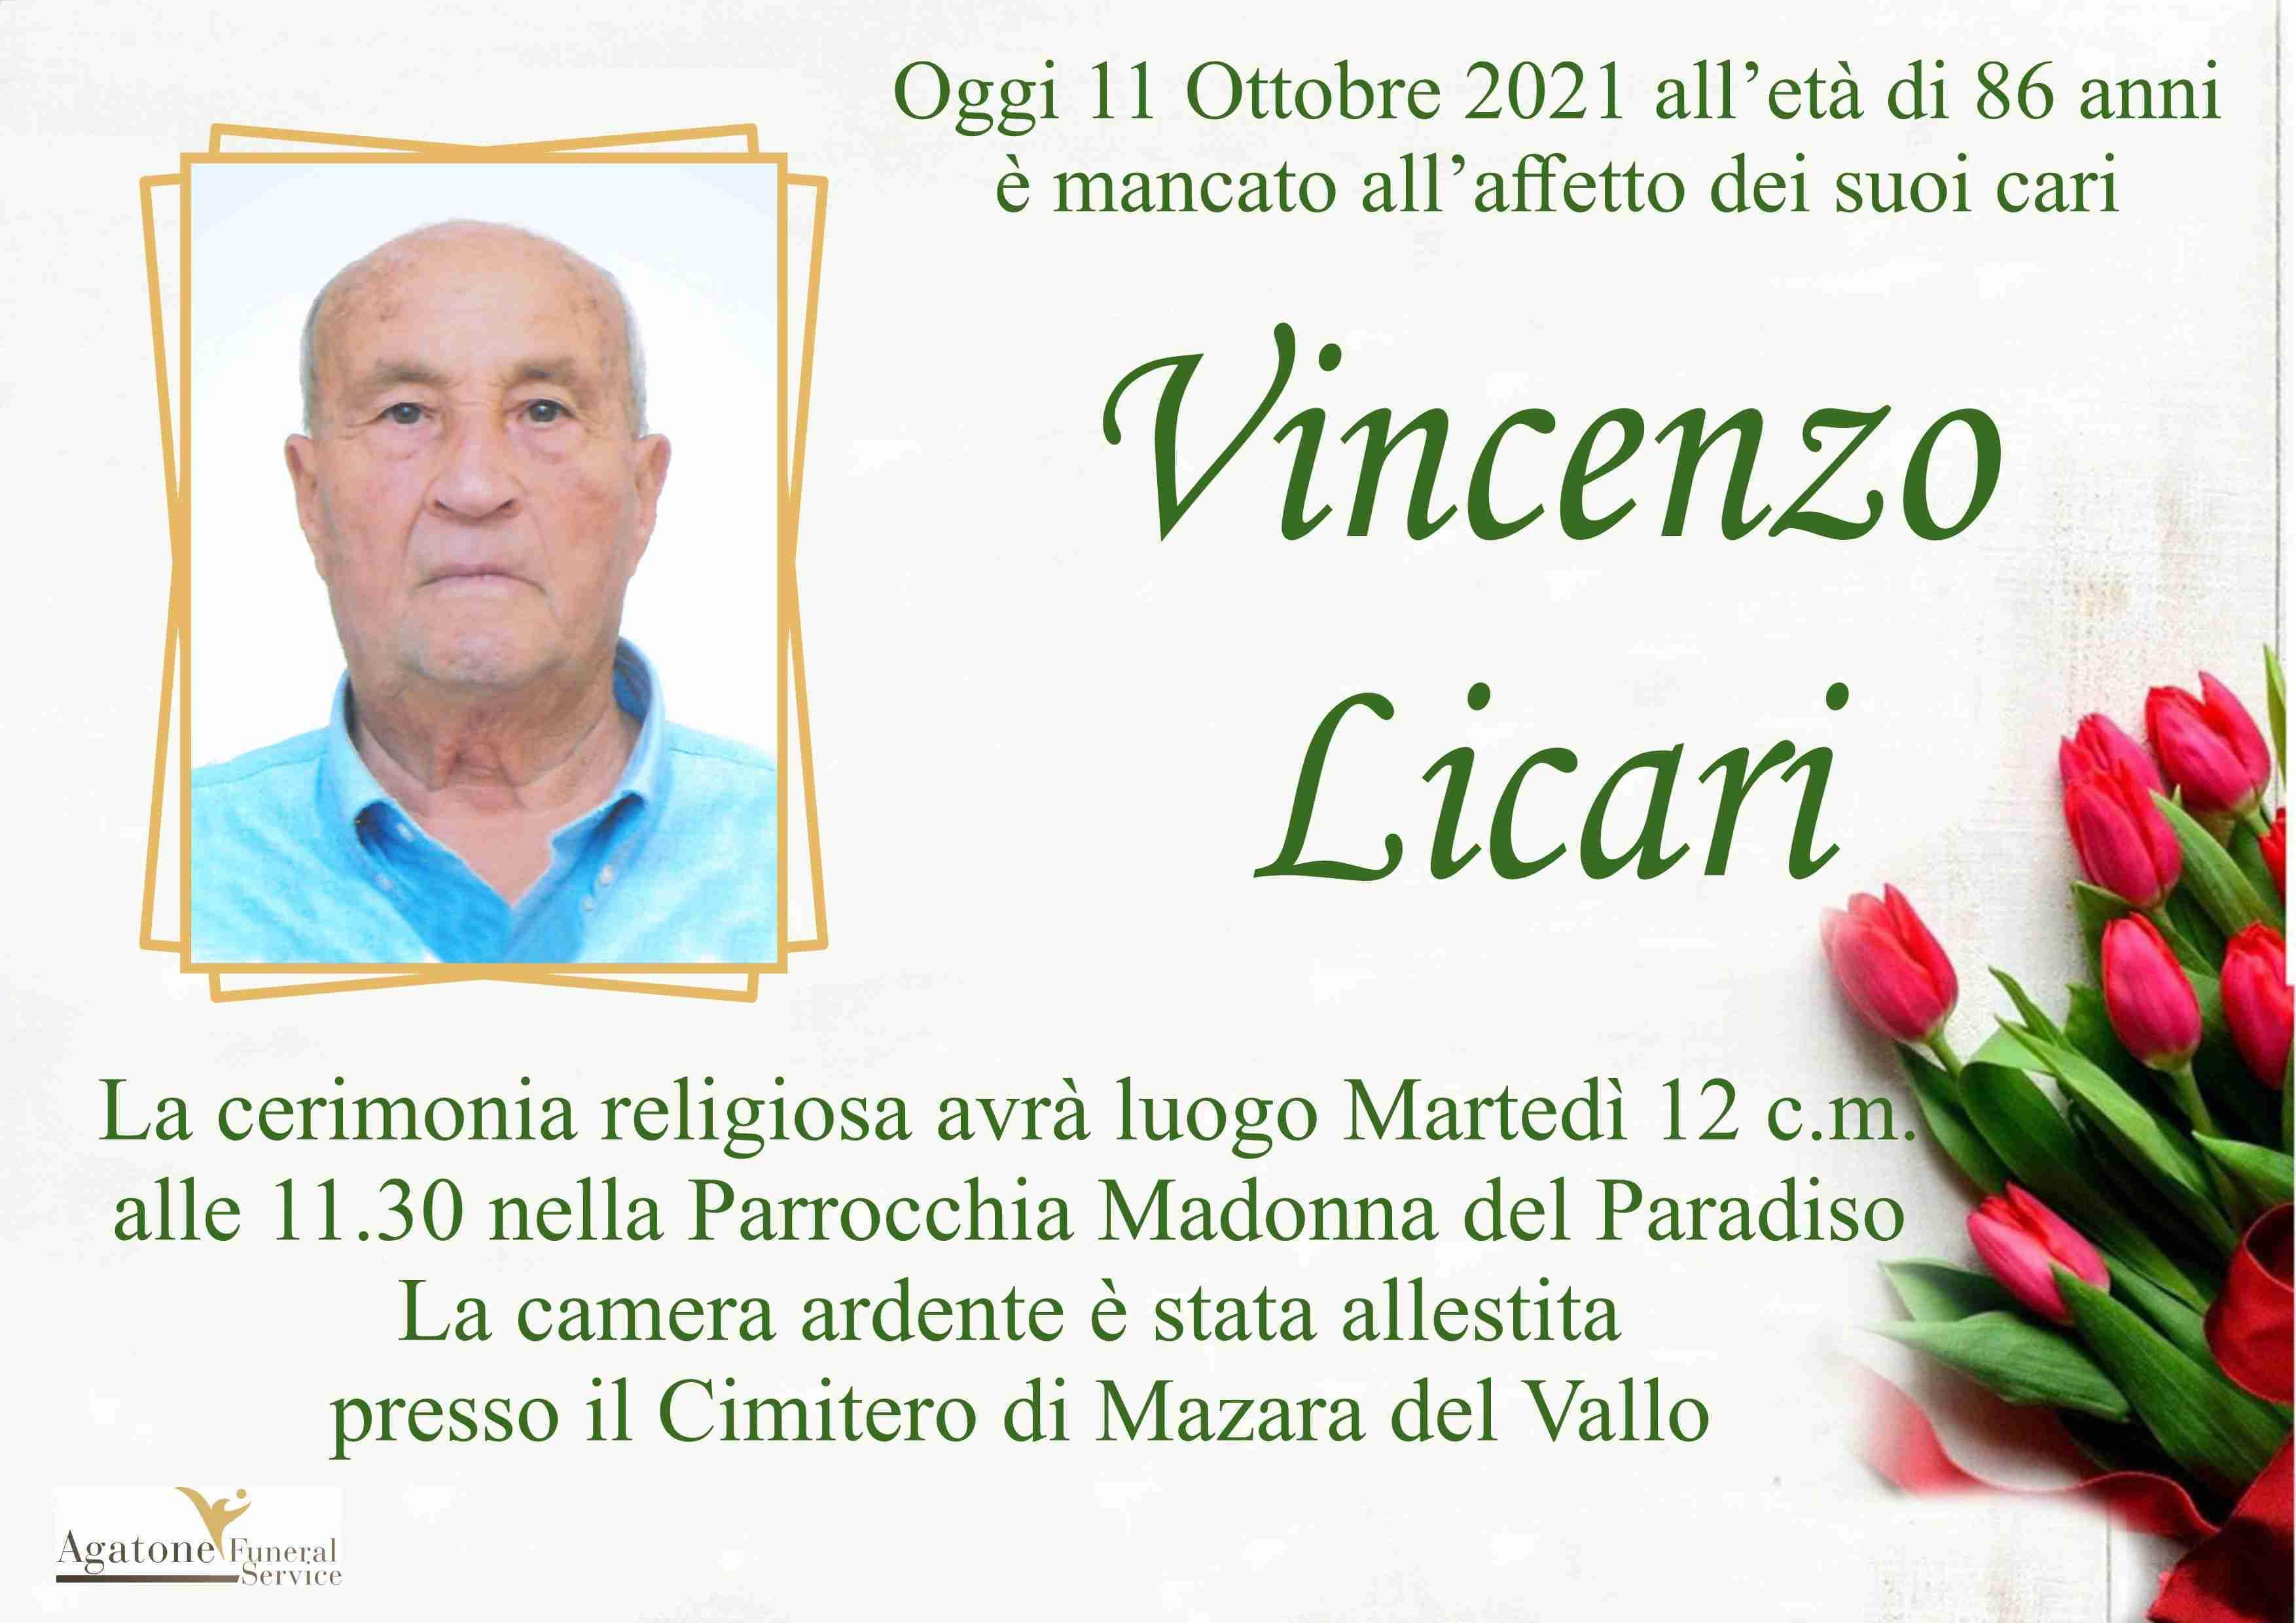 Vincenzo Licari